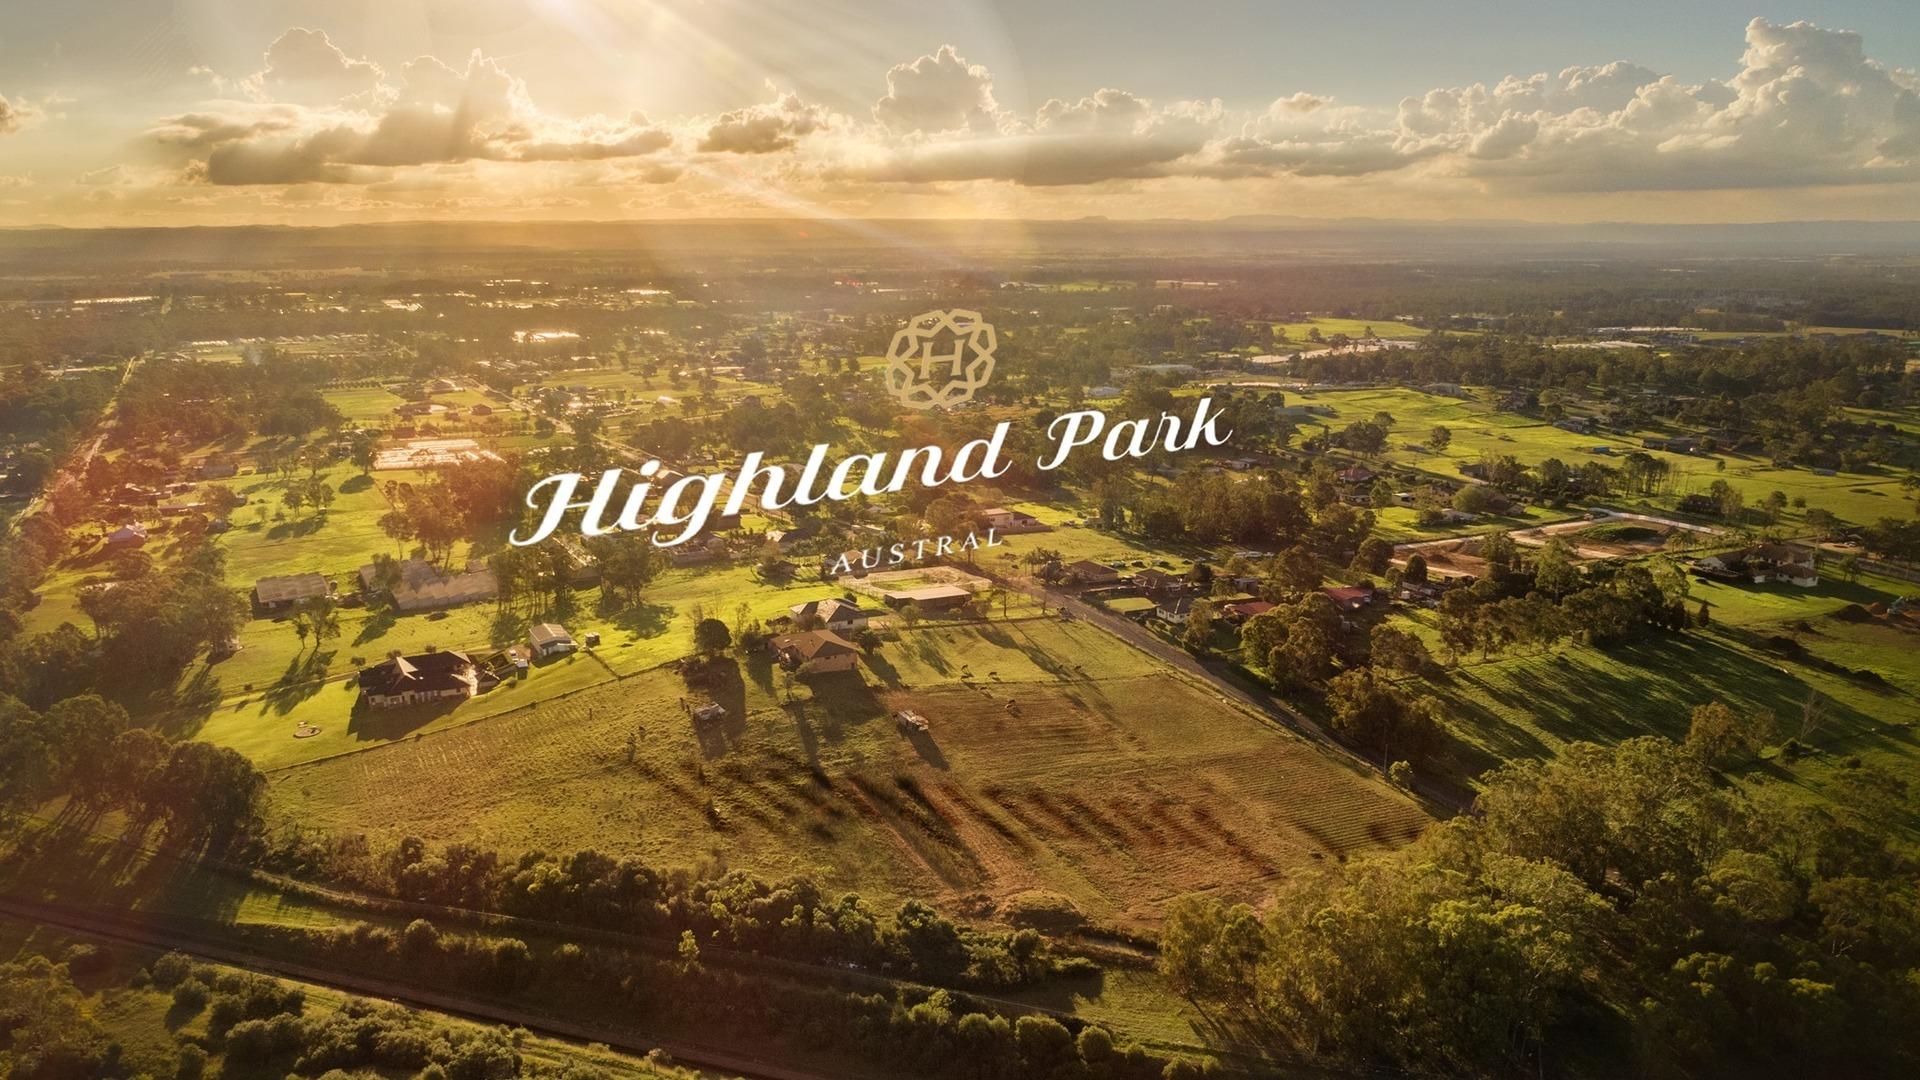 Austral | Highland Park